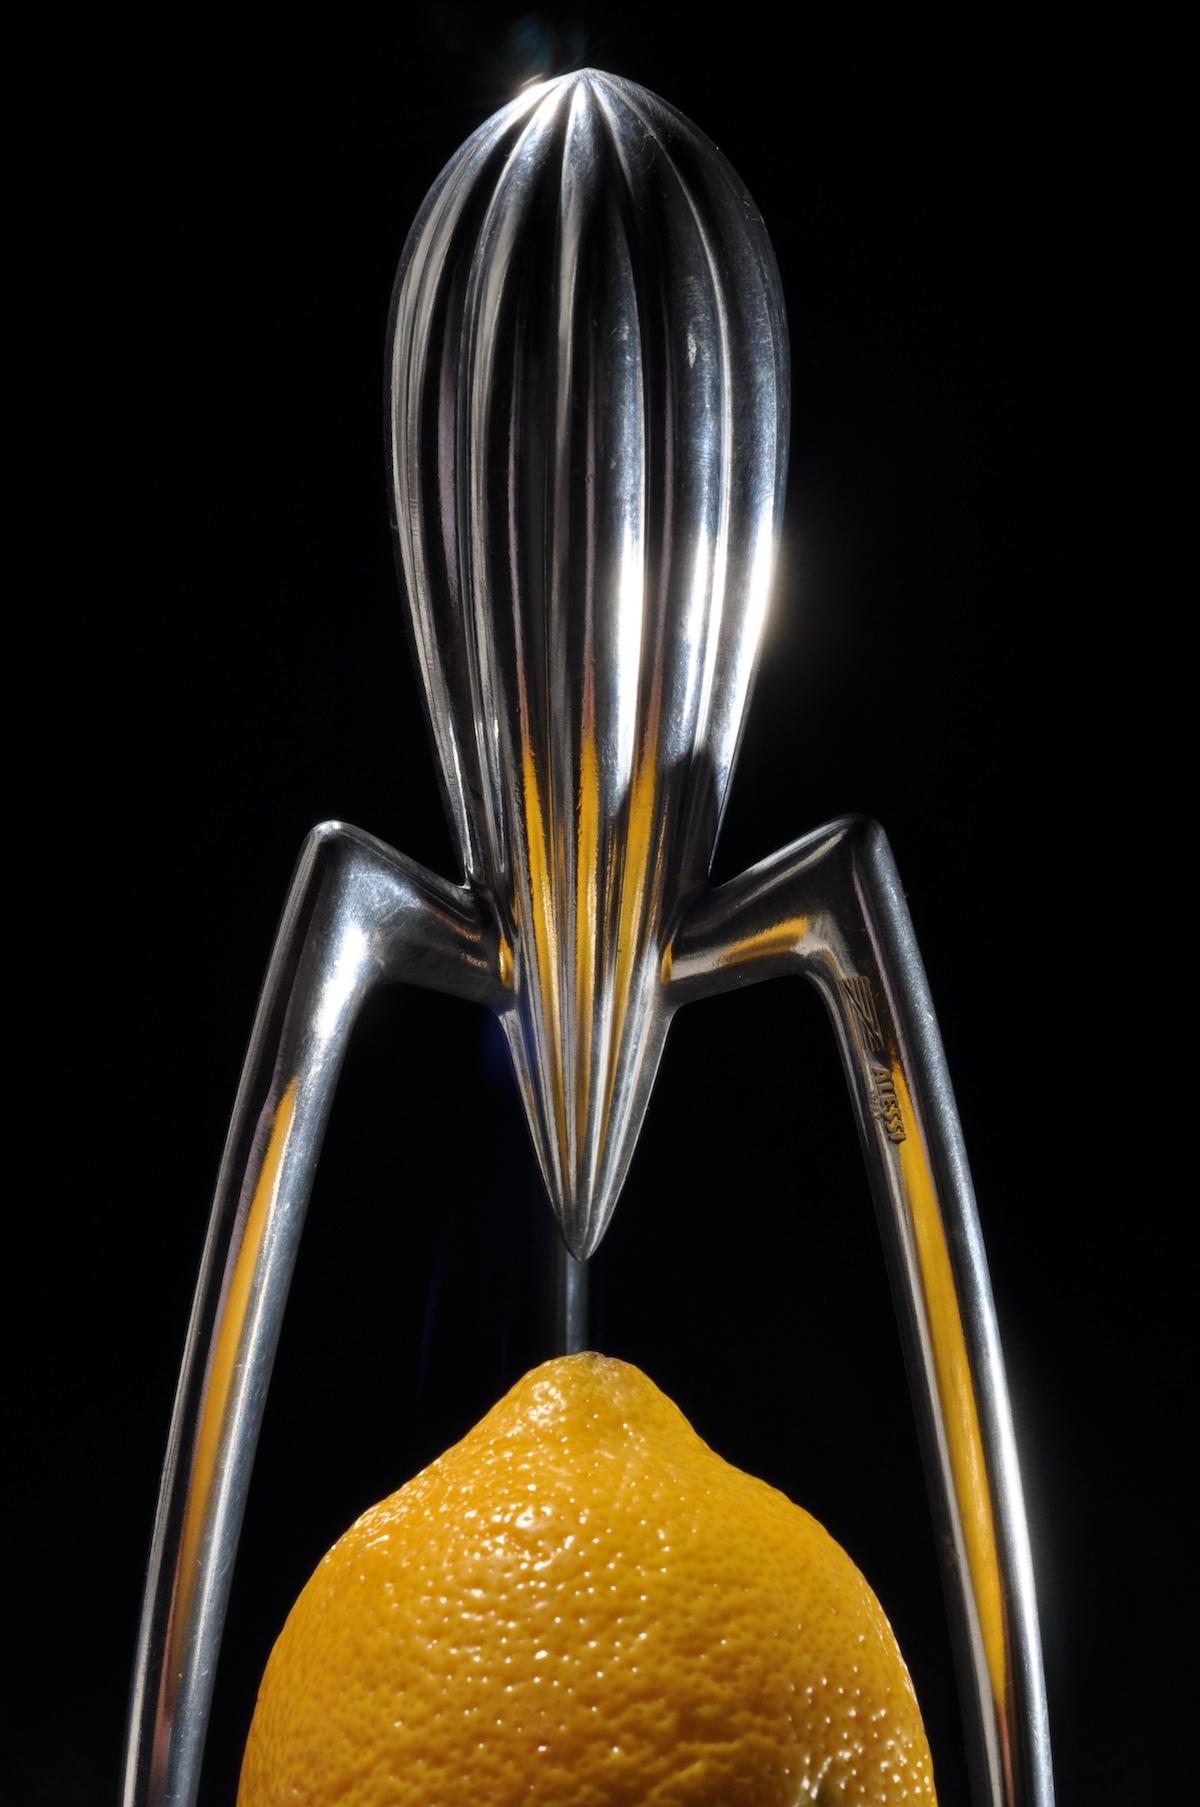 presse agrume juicy salif philipe starck citron